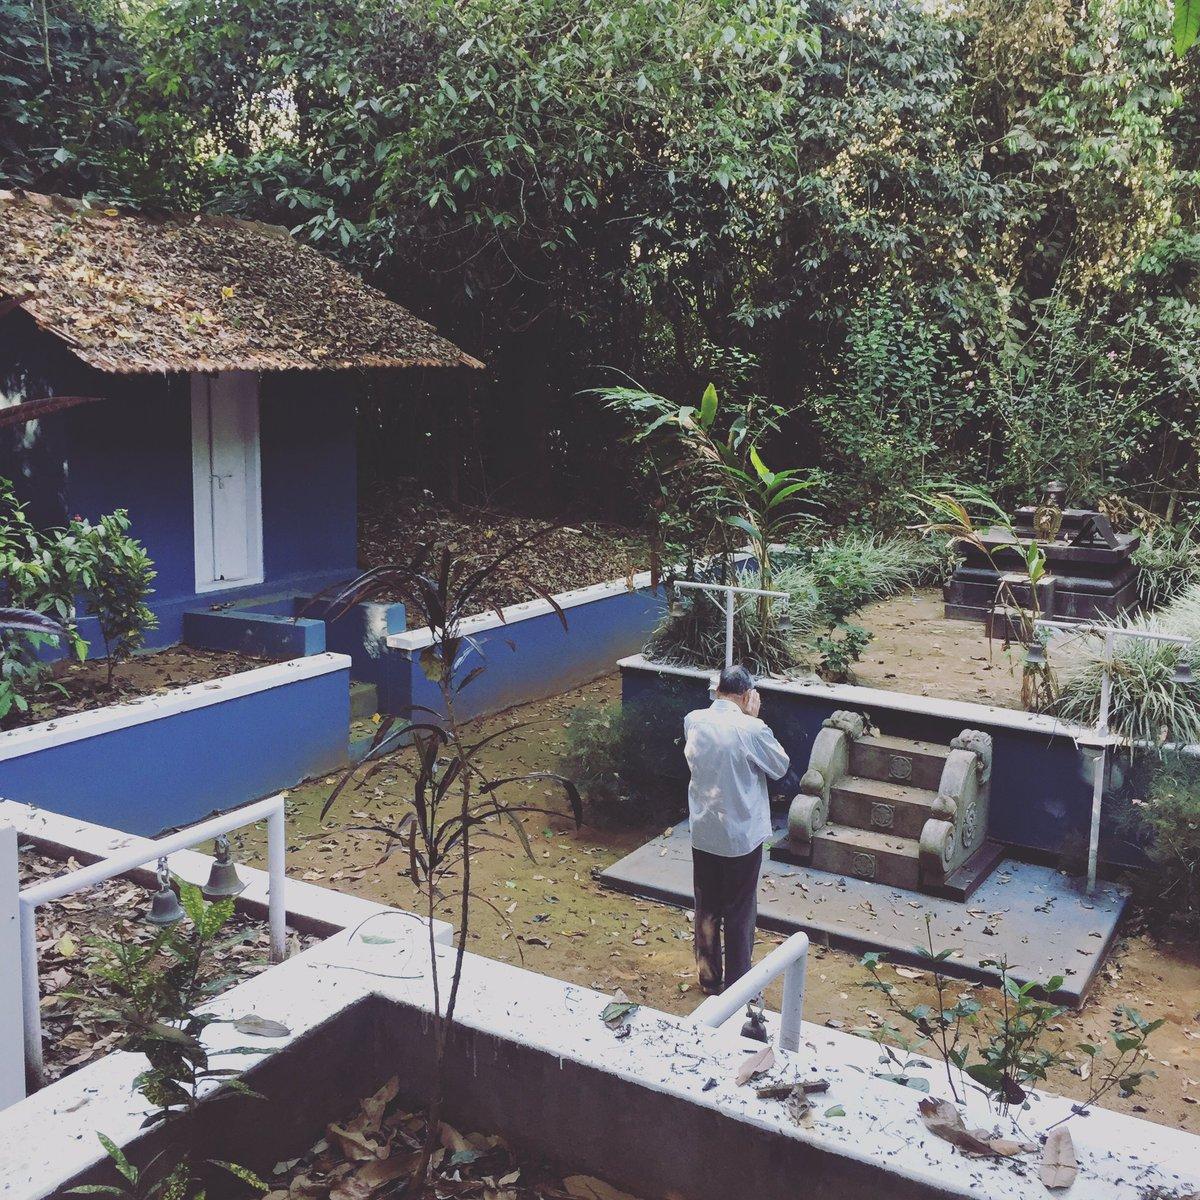 At the 200+ yrs old Neelyat Sarthavu Swamy Devasthana in my hometown of Kokery (Coorg).